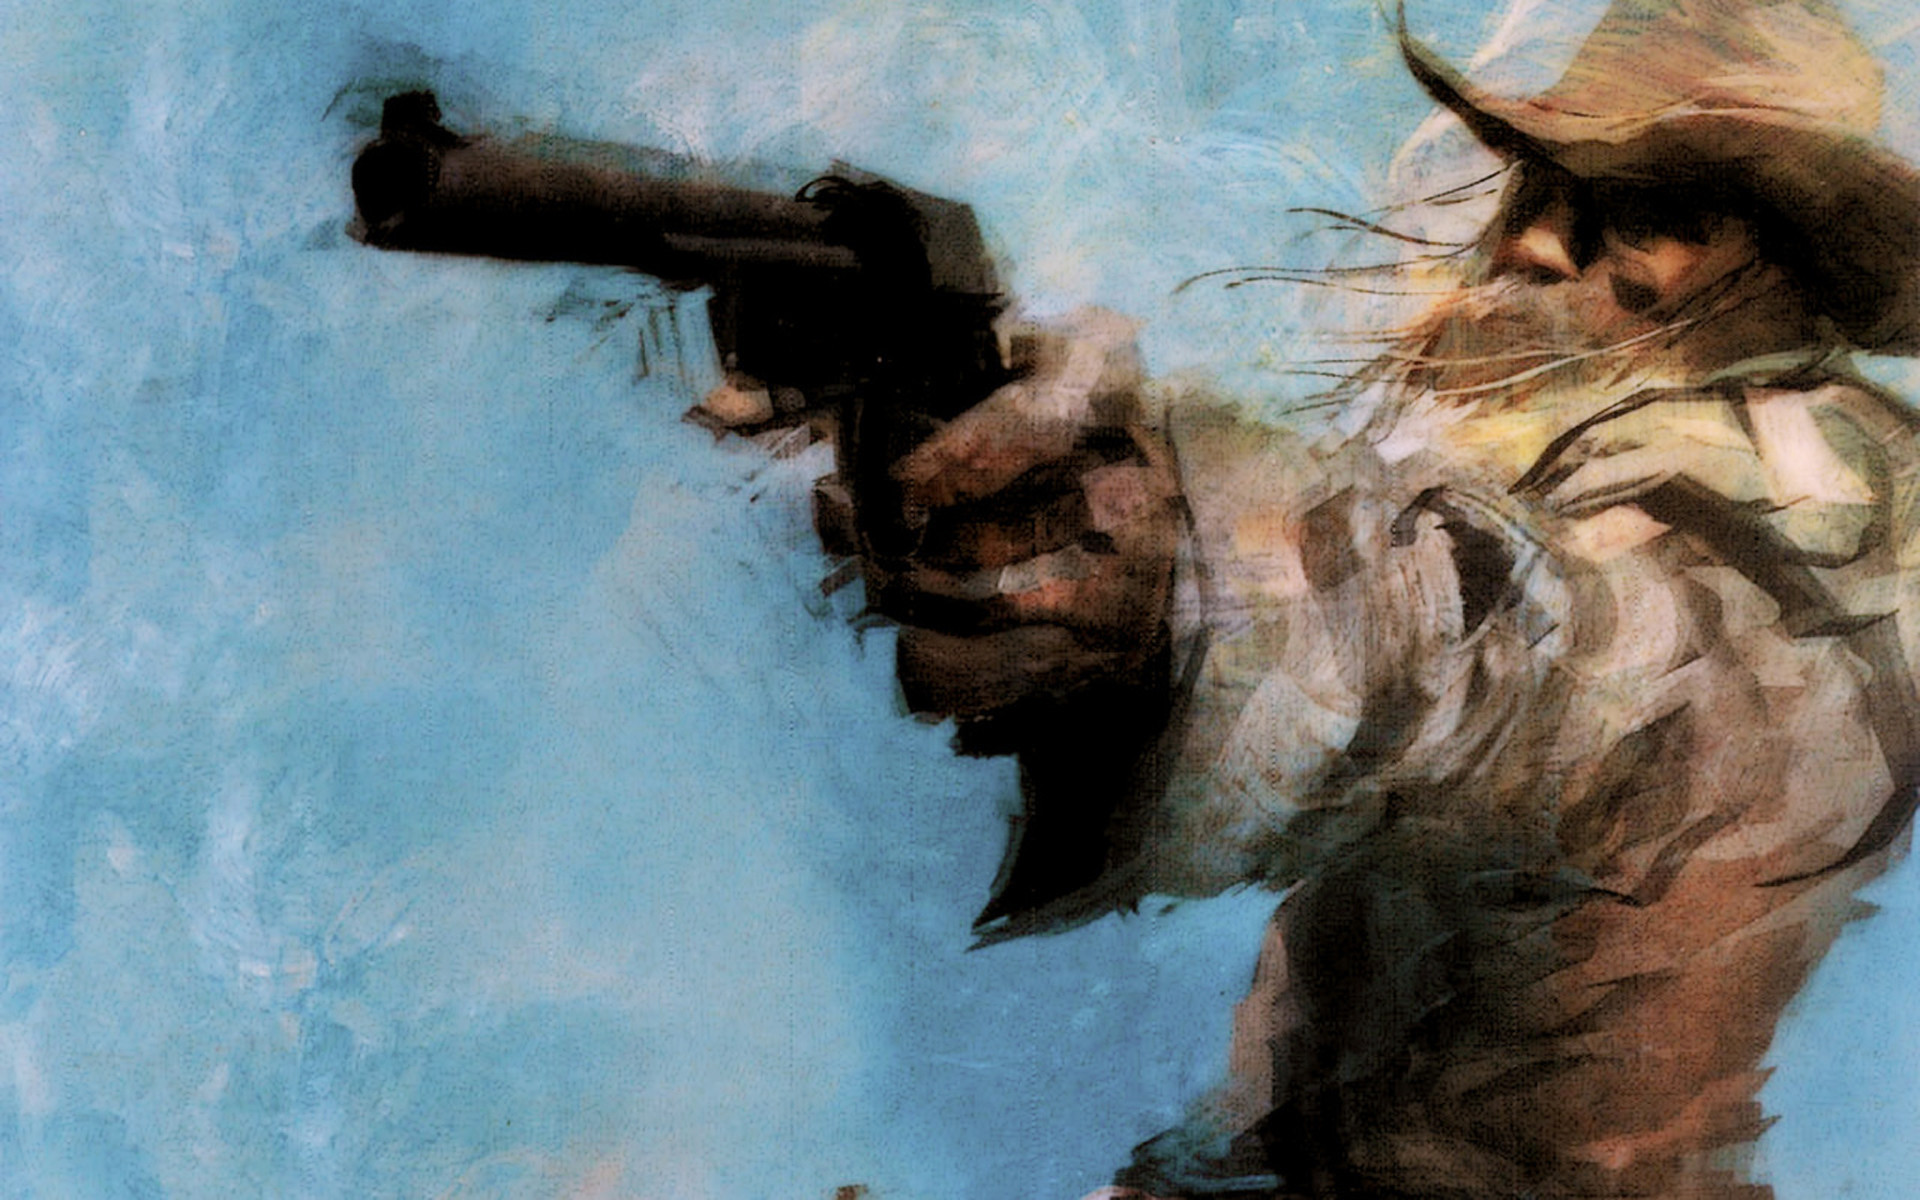 Cowboy revolver art #6928837